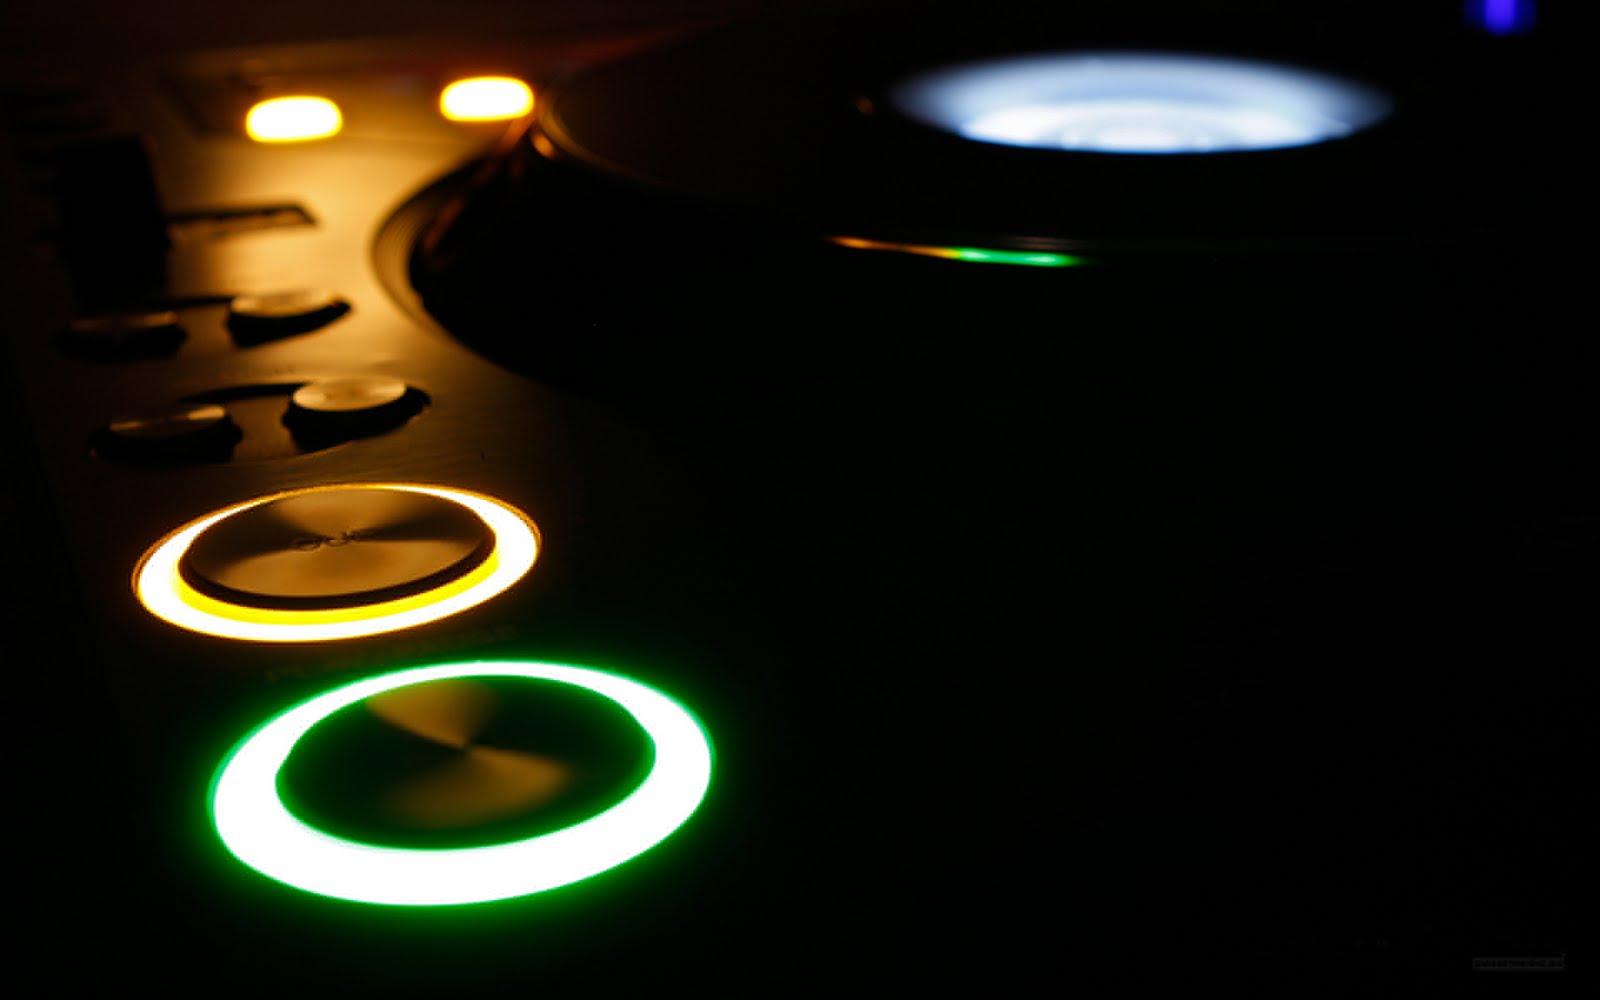 http://4.bp.blogspot.com/-73W6O6Z2nQ4/TeNAGZzaVrI/AAAAAAAABmY/HiyiUKdSmEQ/s1600/music+button.jpg